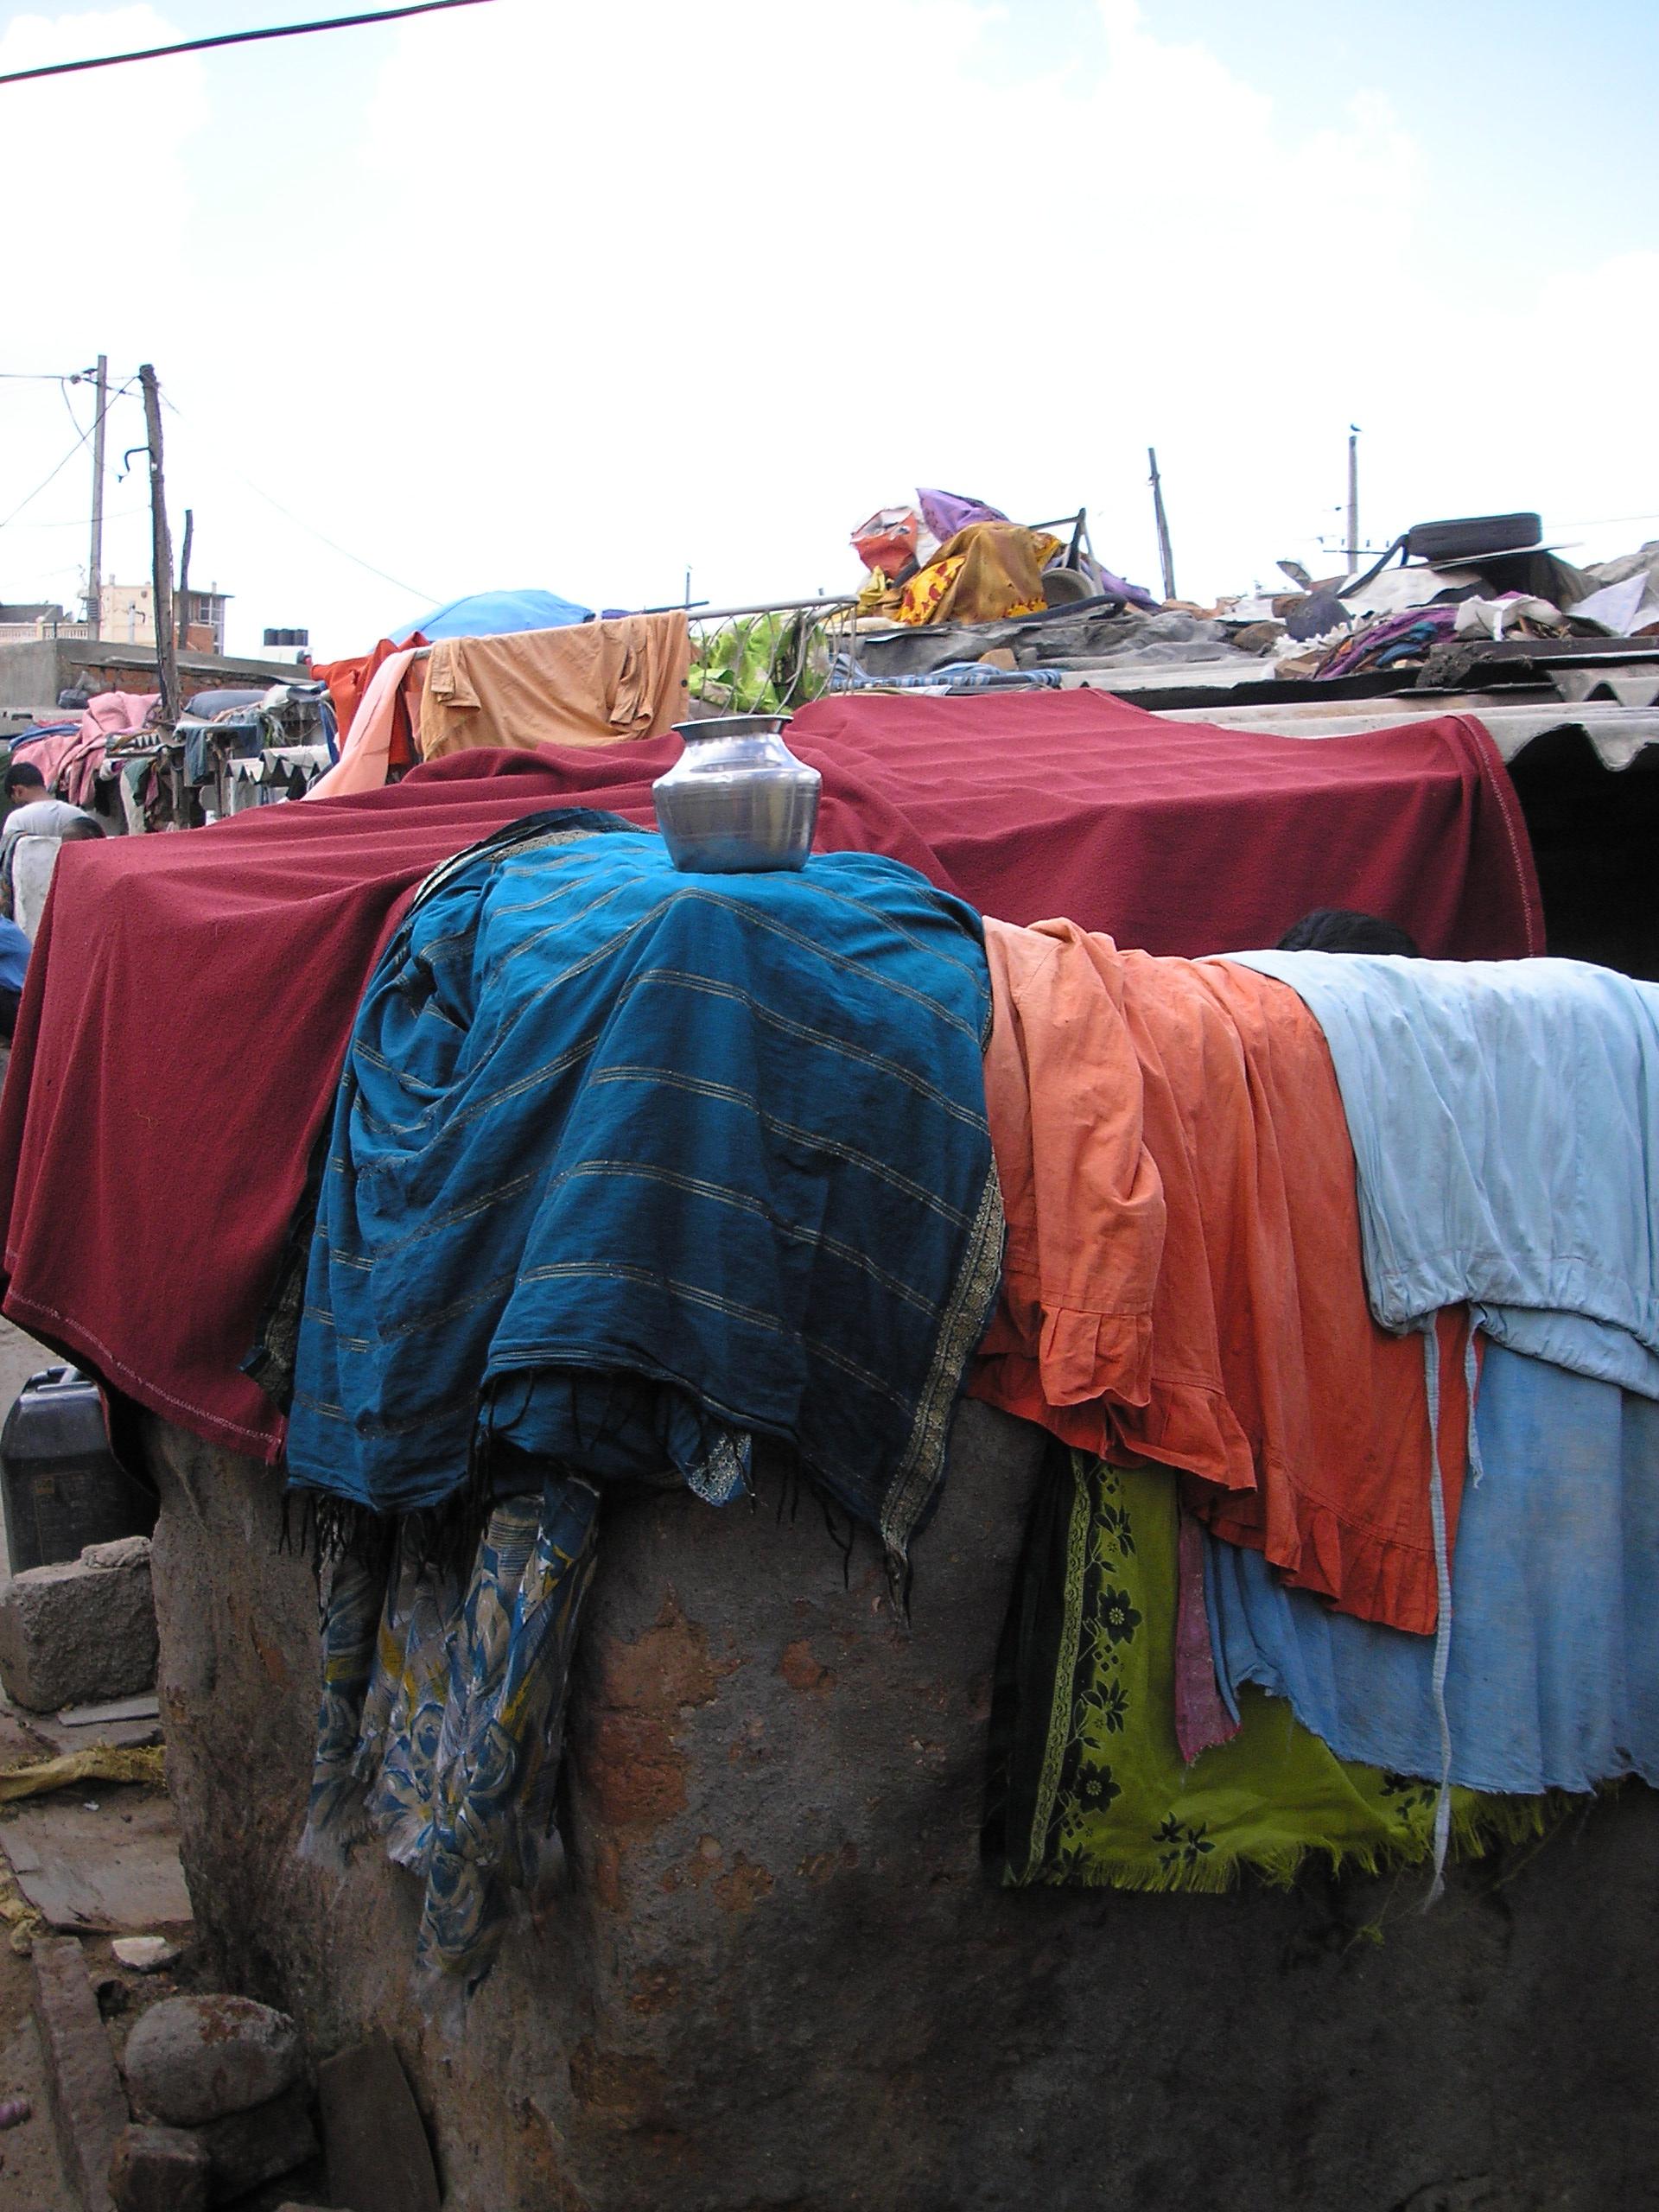 Slum di Bangalor - Tele stese